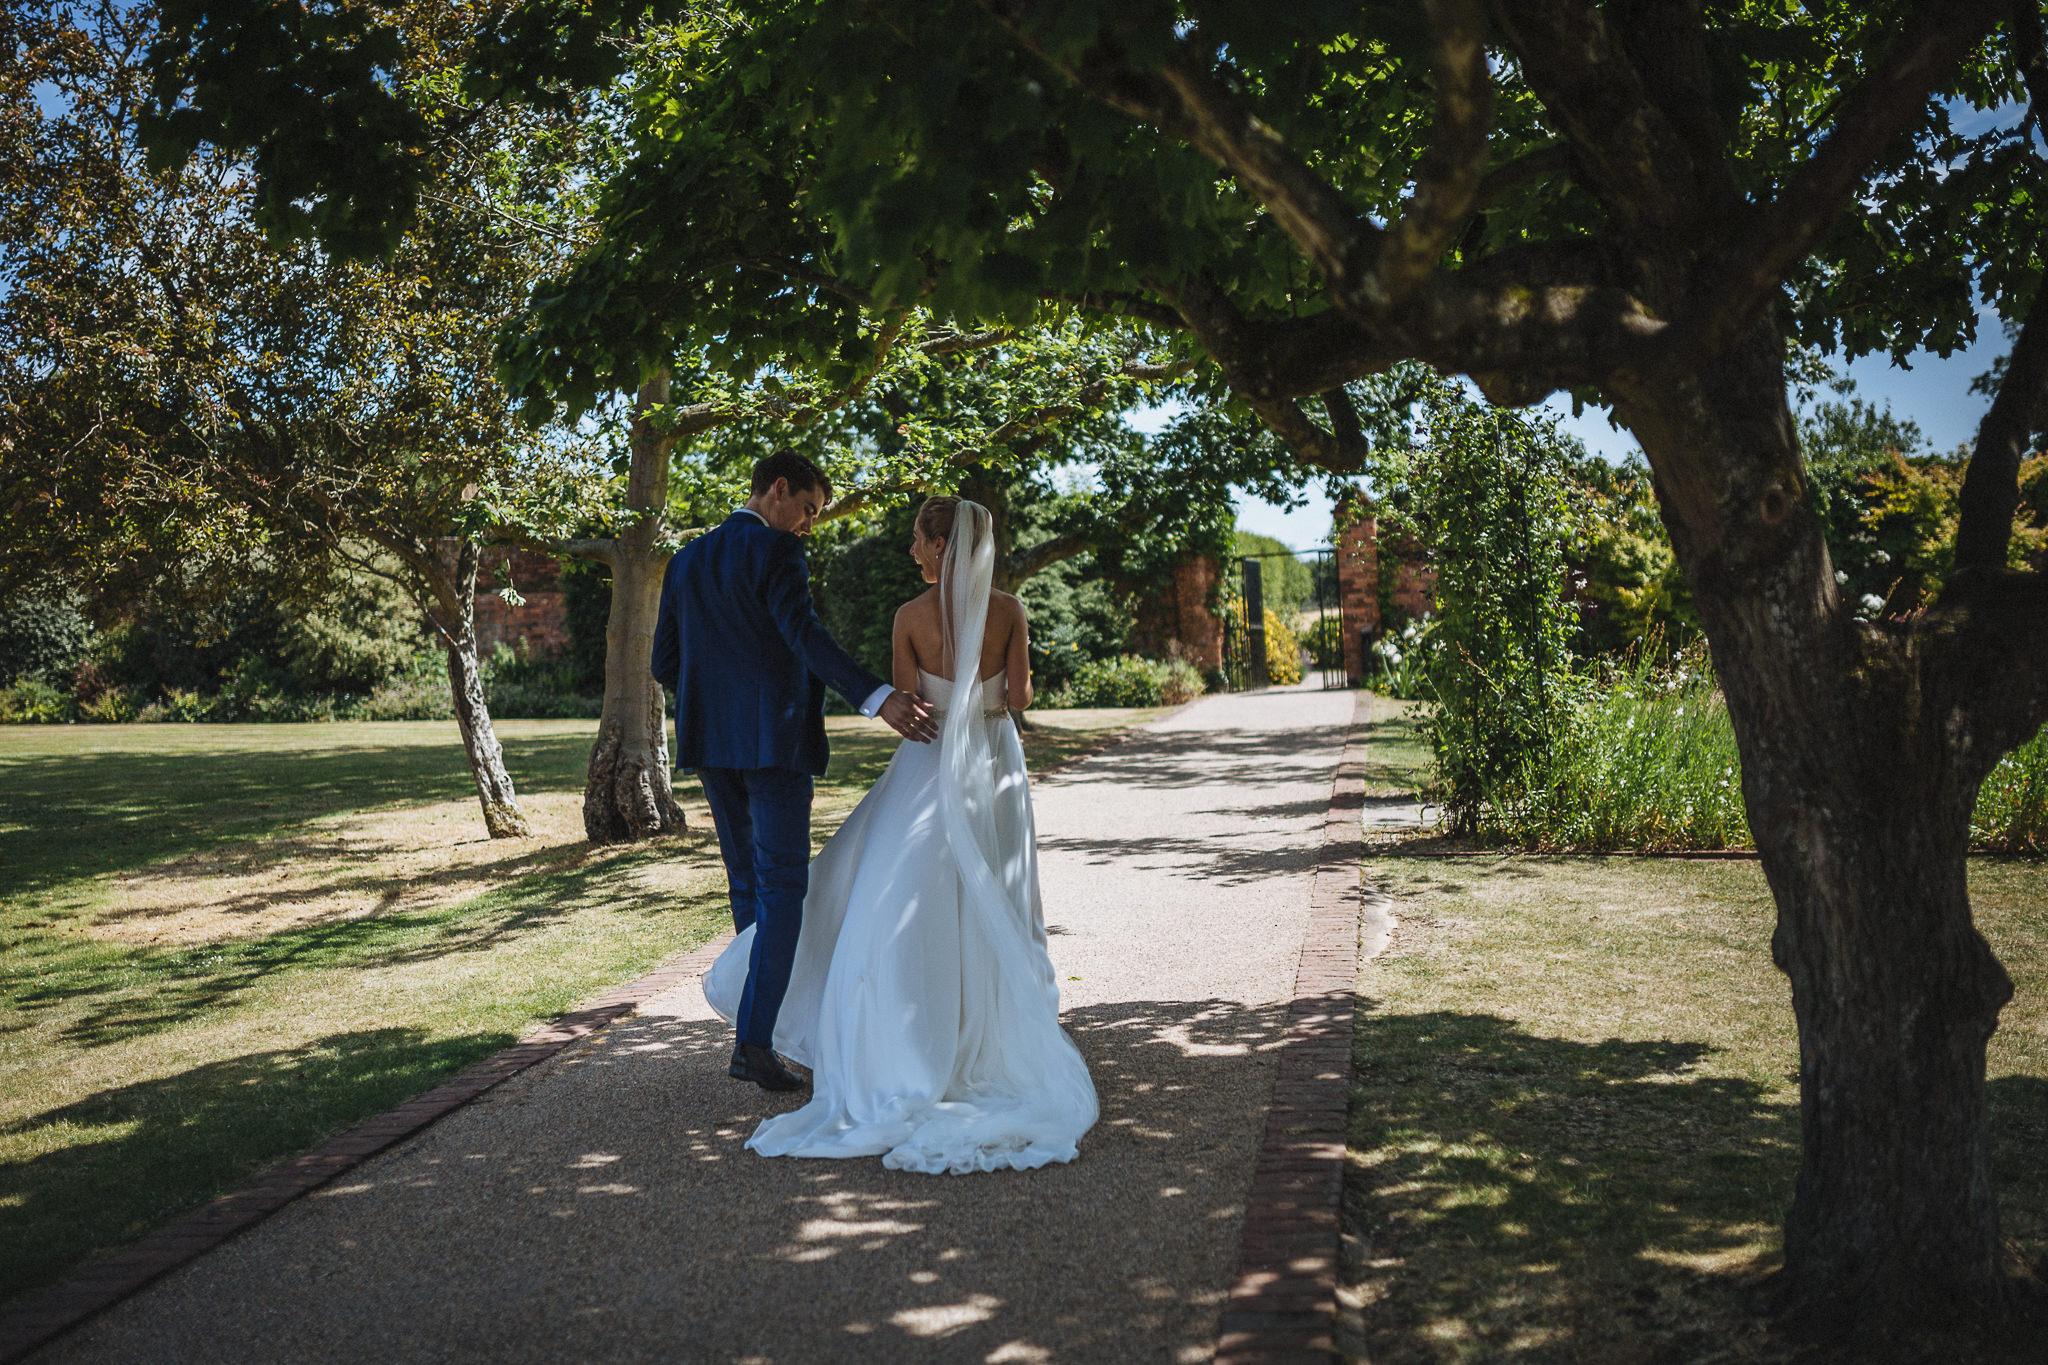 paul-marbrook-Gaynes-Park Wedding-Photographer-90057